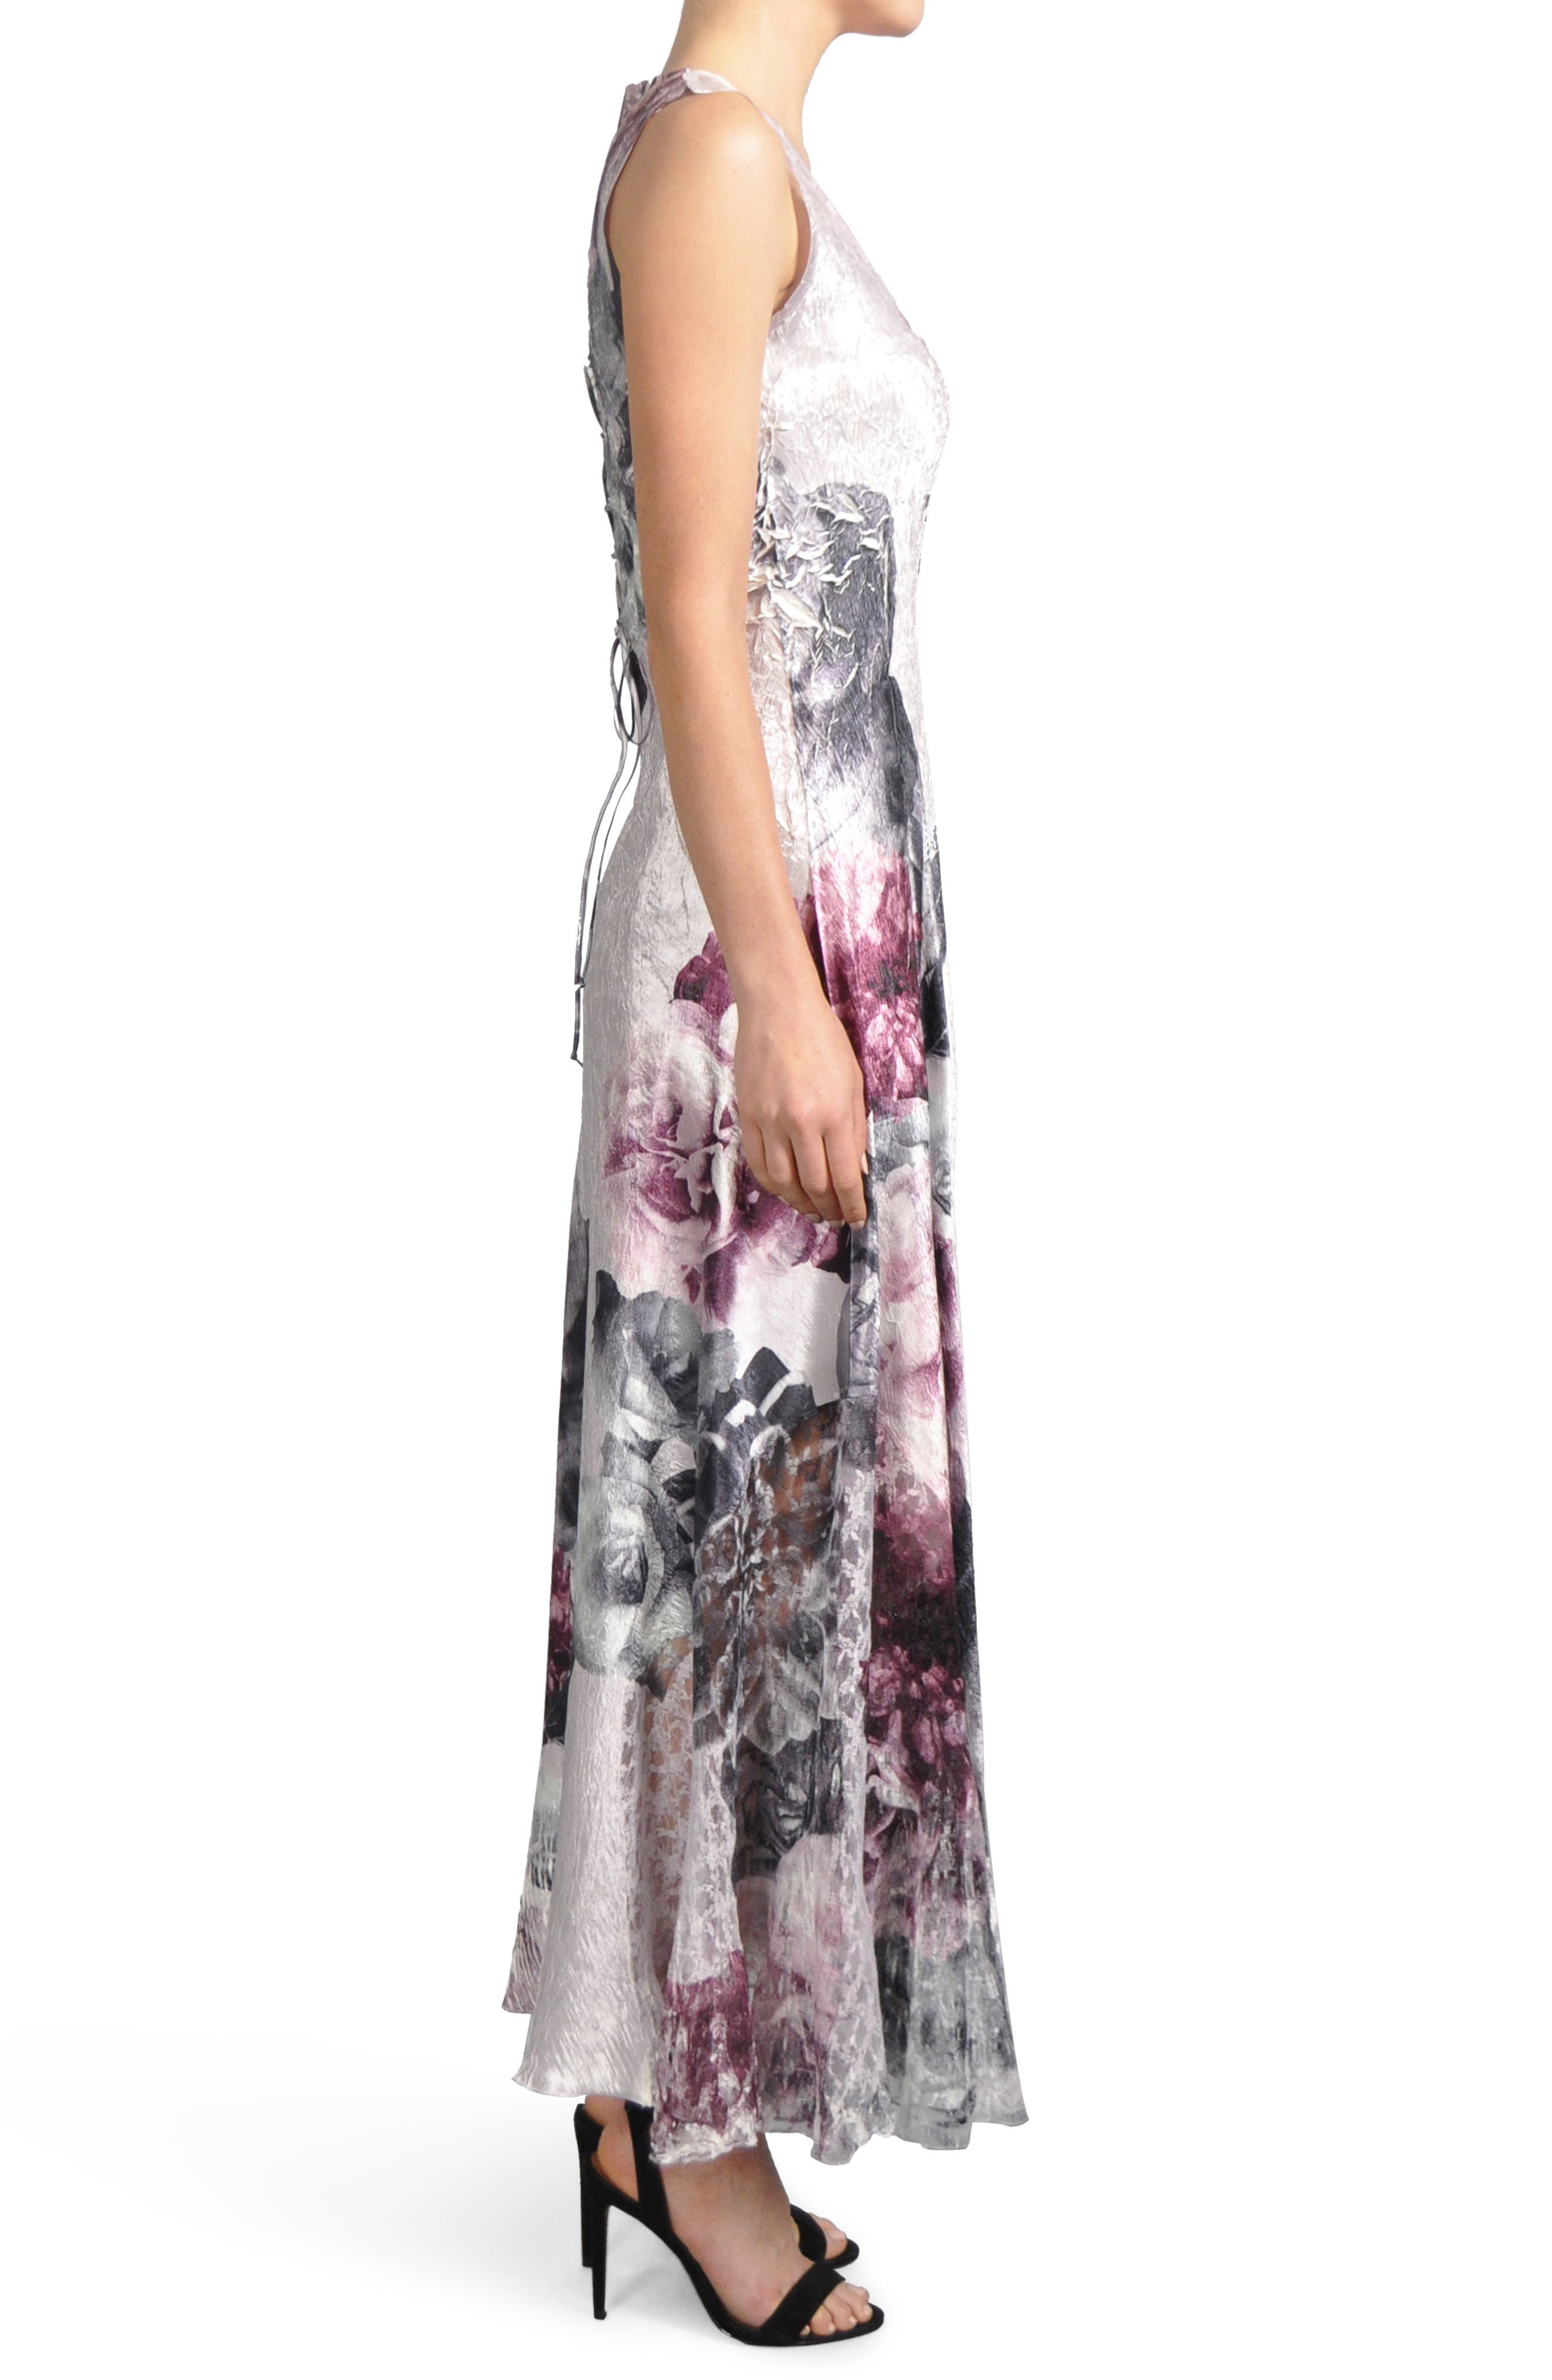 Komorav Lace-Up Back Maxi Dress with Shawl,                             Alternate thumbnail 3, color,                             508